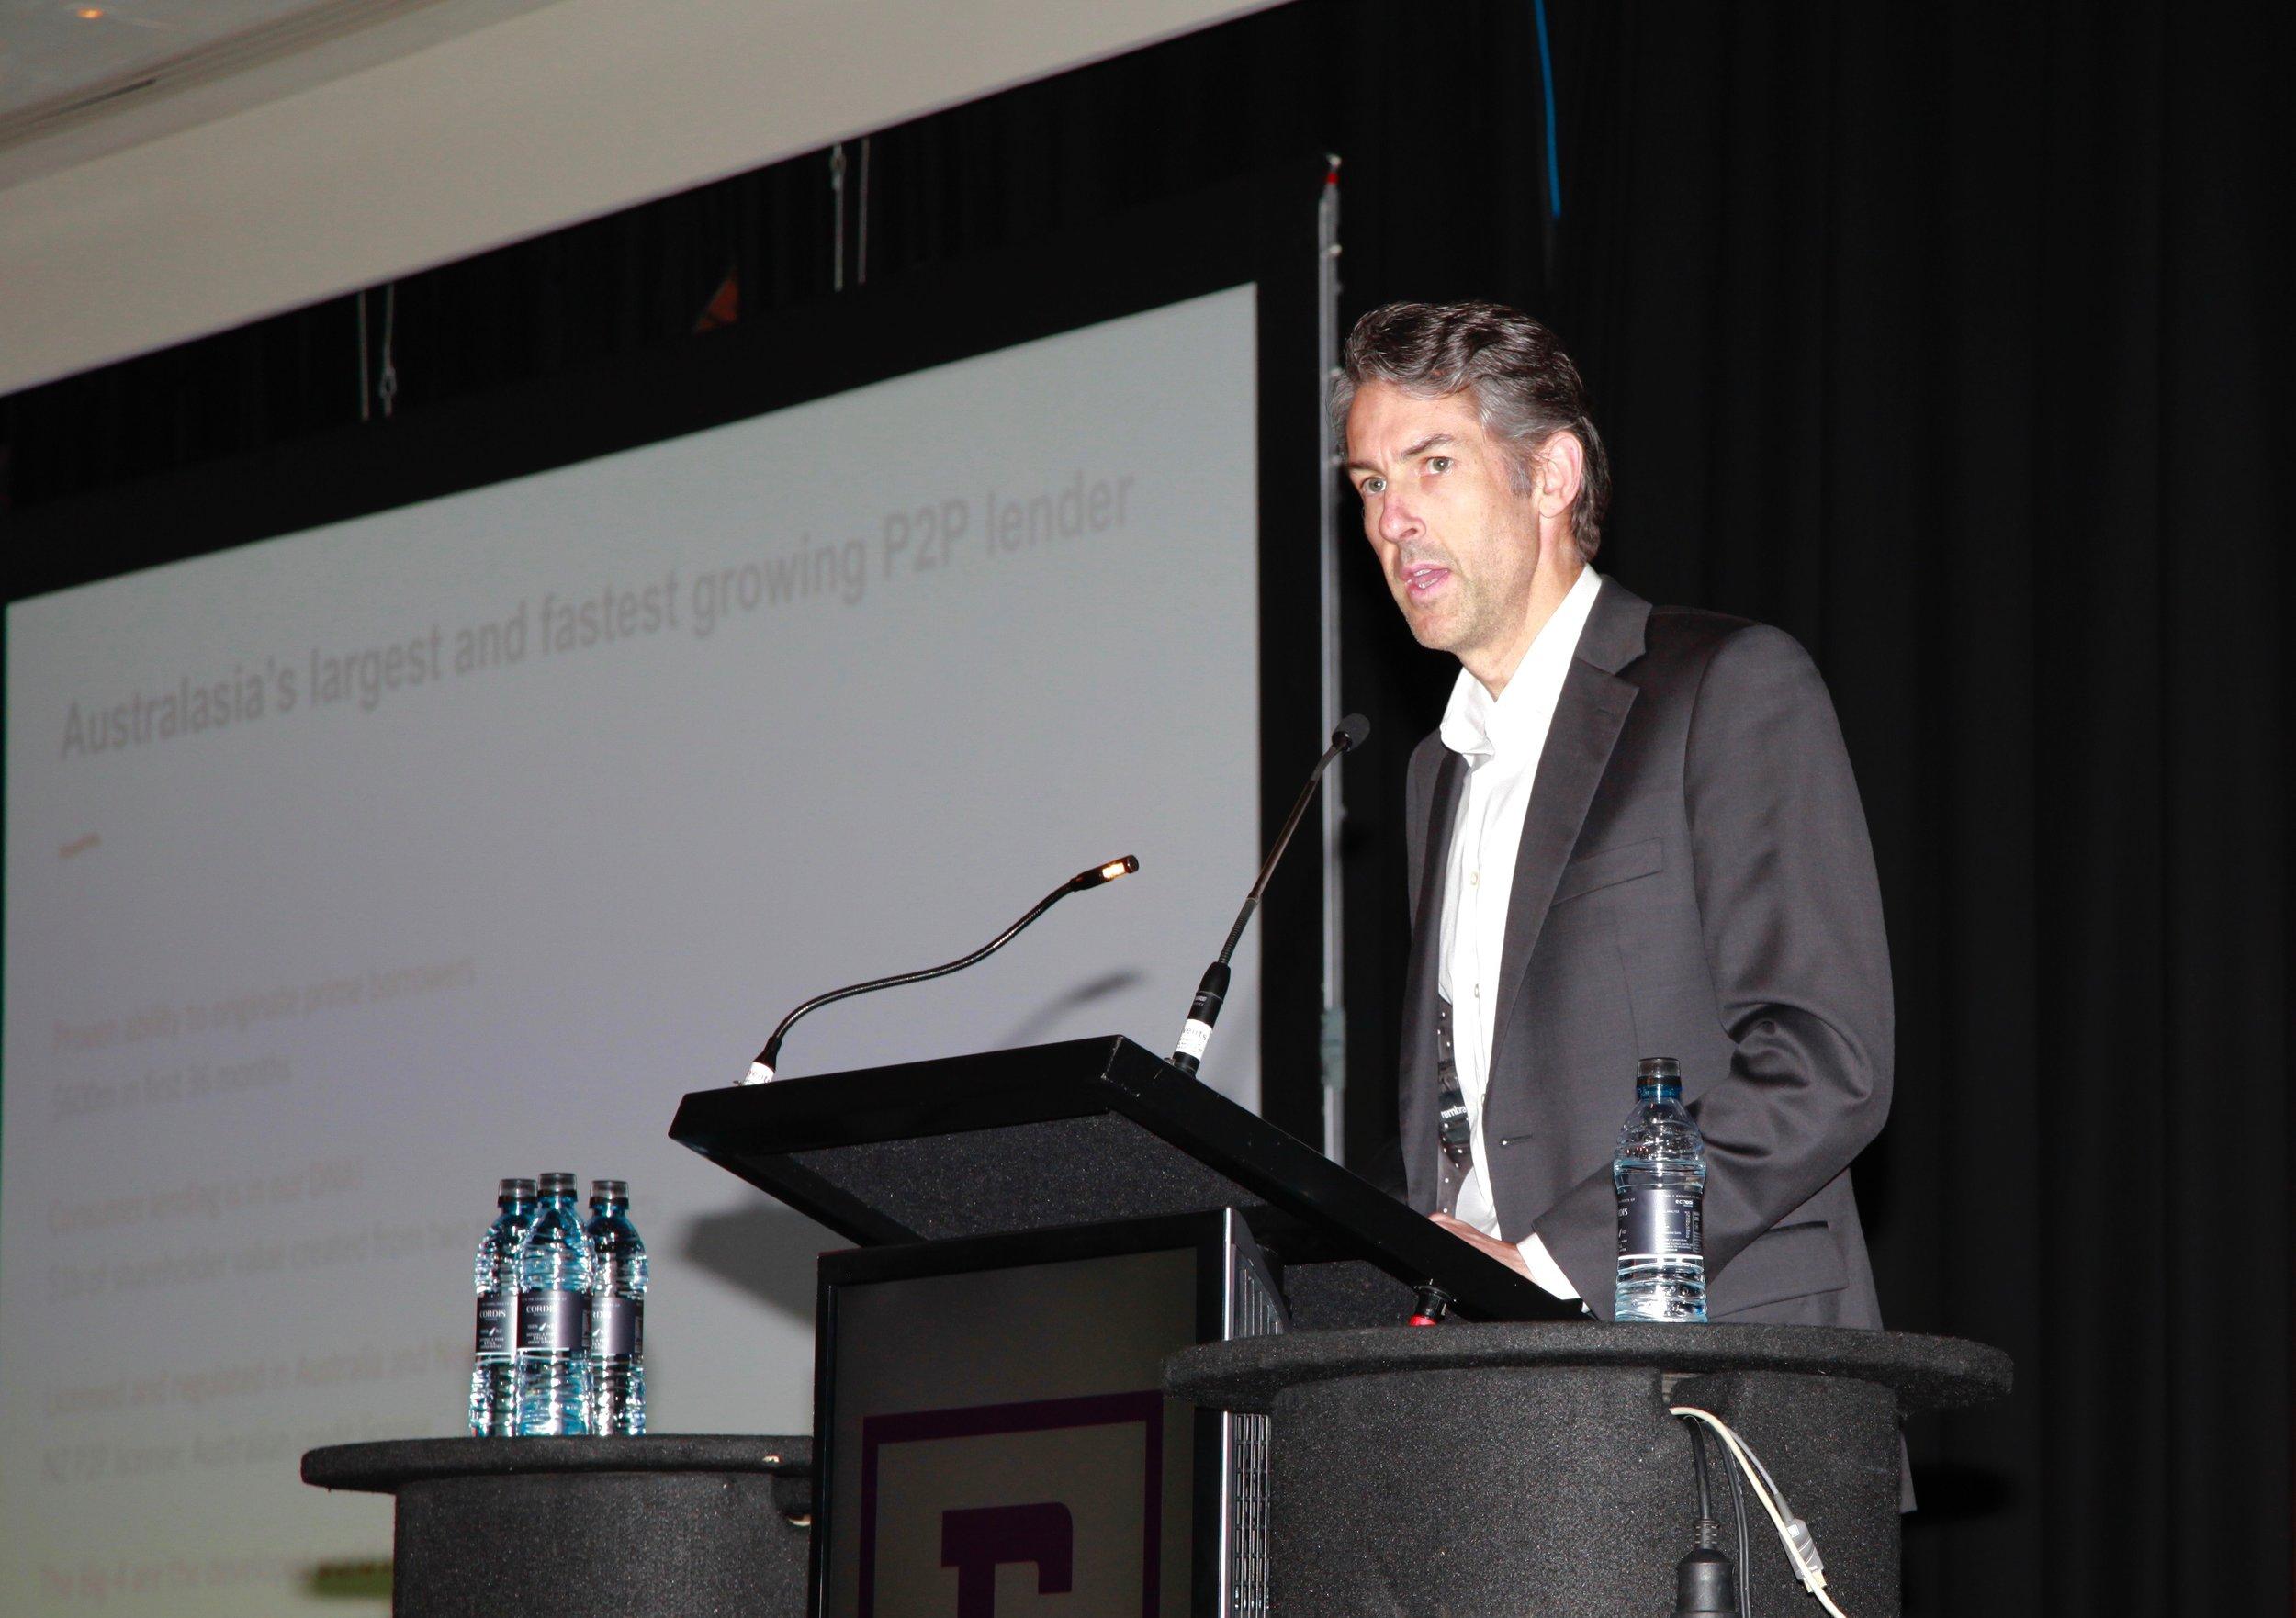 Duncan Gross, Chief Technology Officer, Harmoney